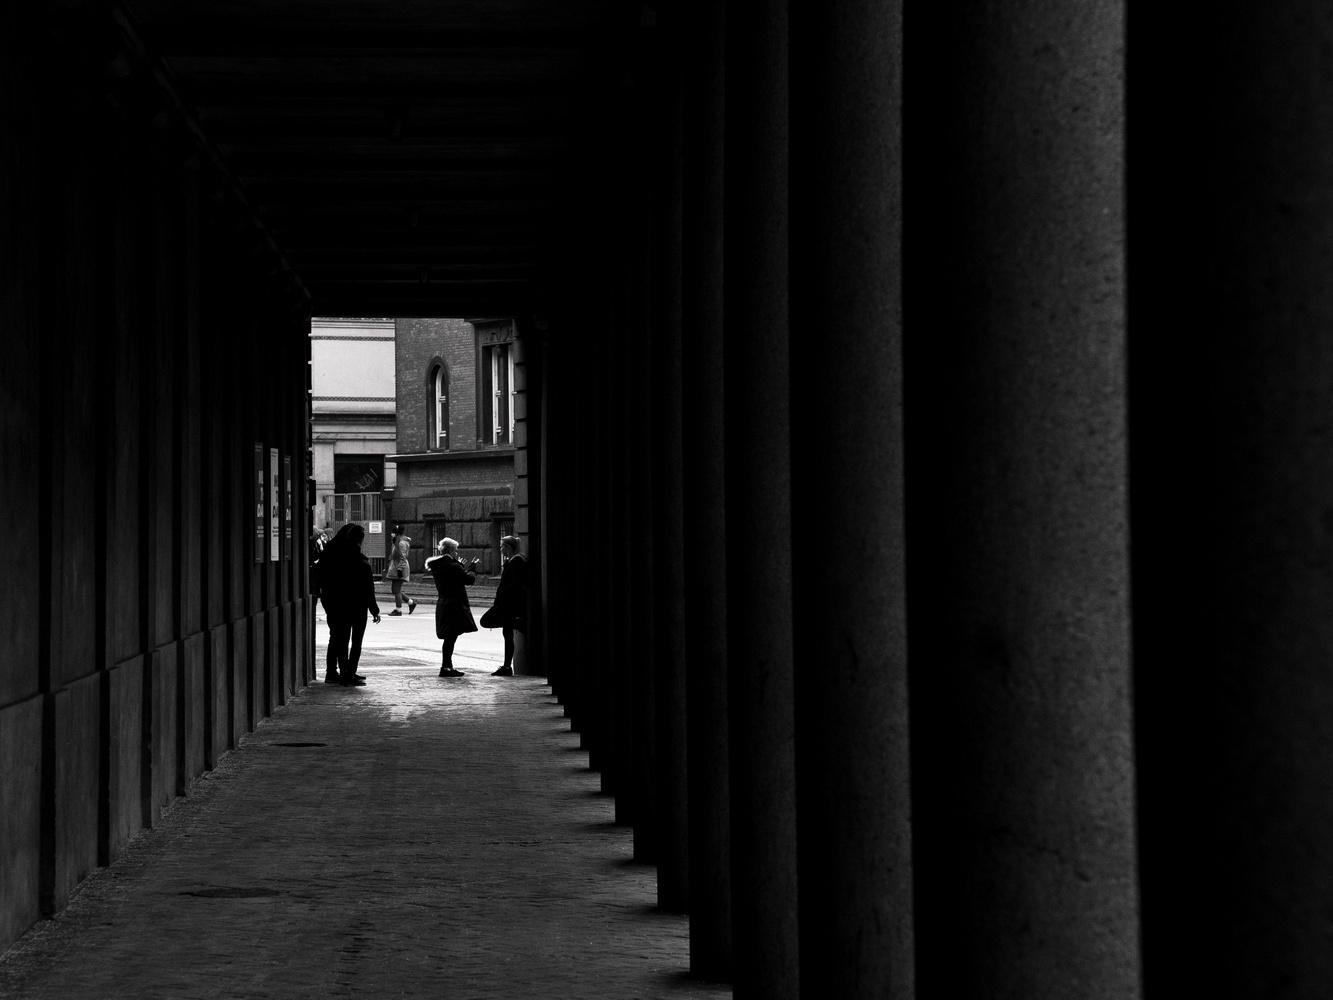 Copenhagen streets by Thomas Wragg